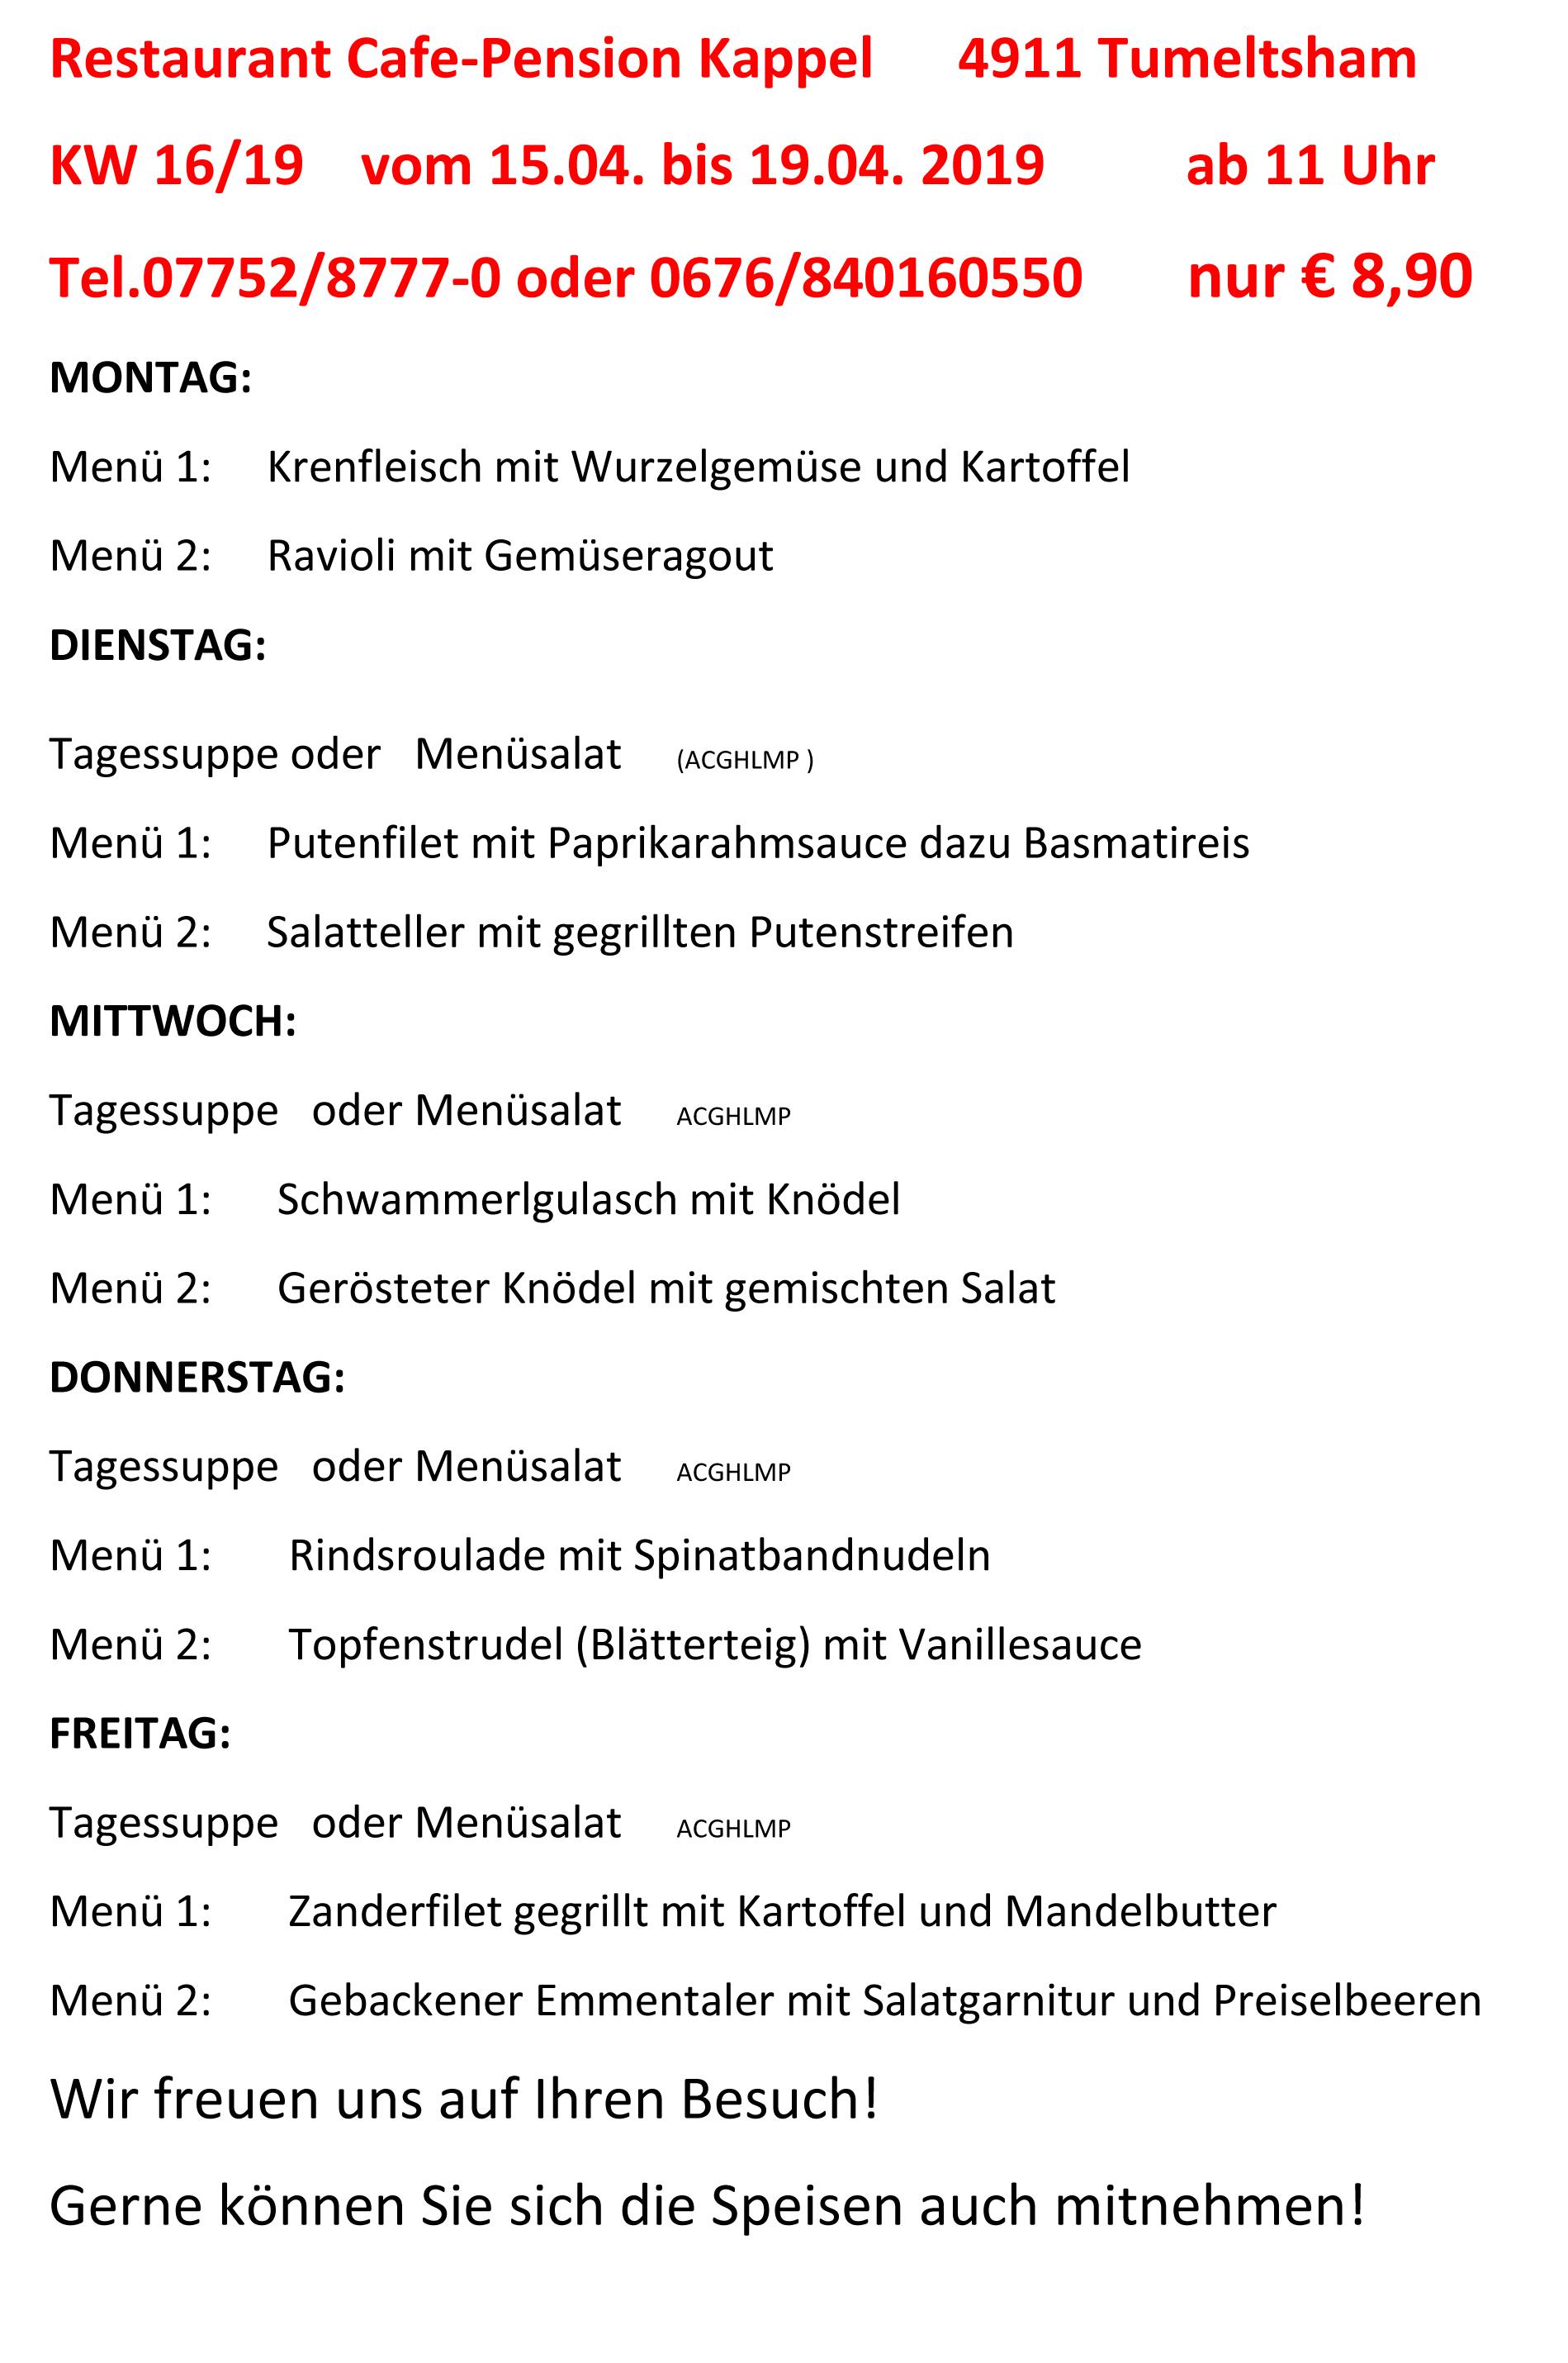 Menüplan KW 16-19 docx (1)